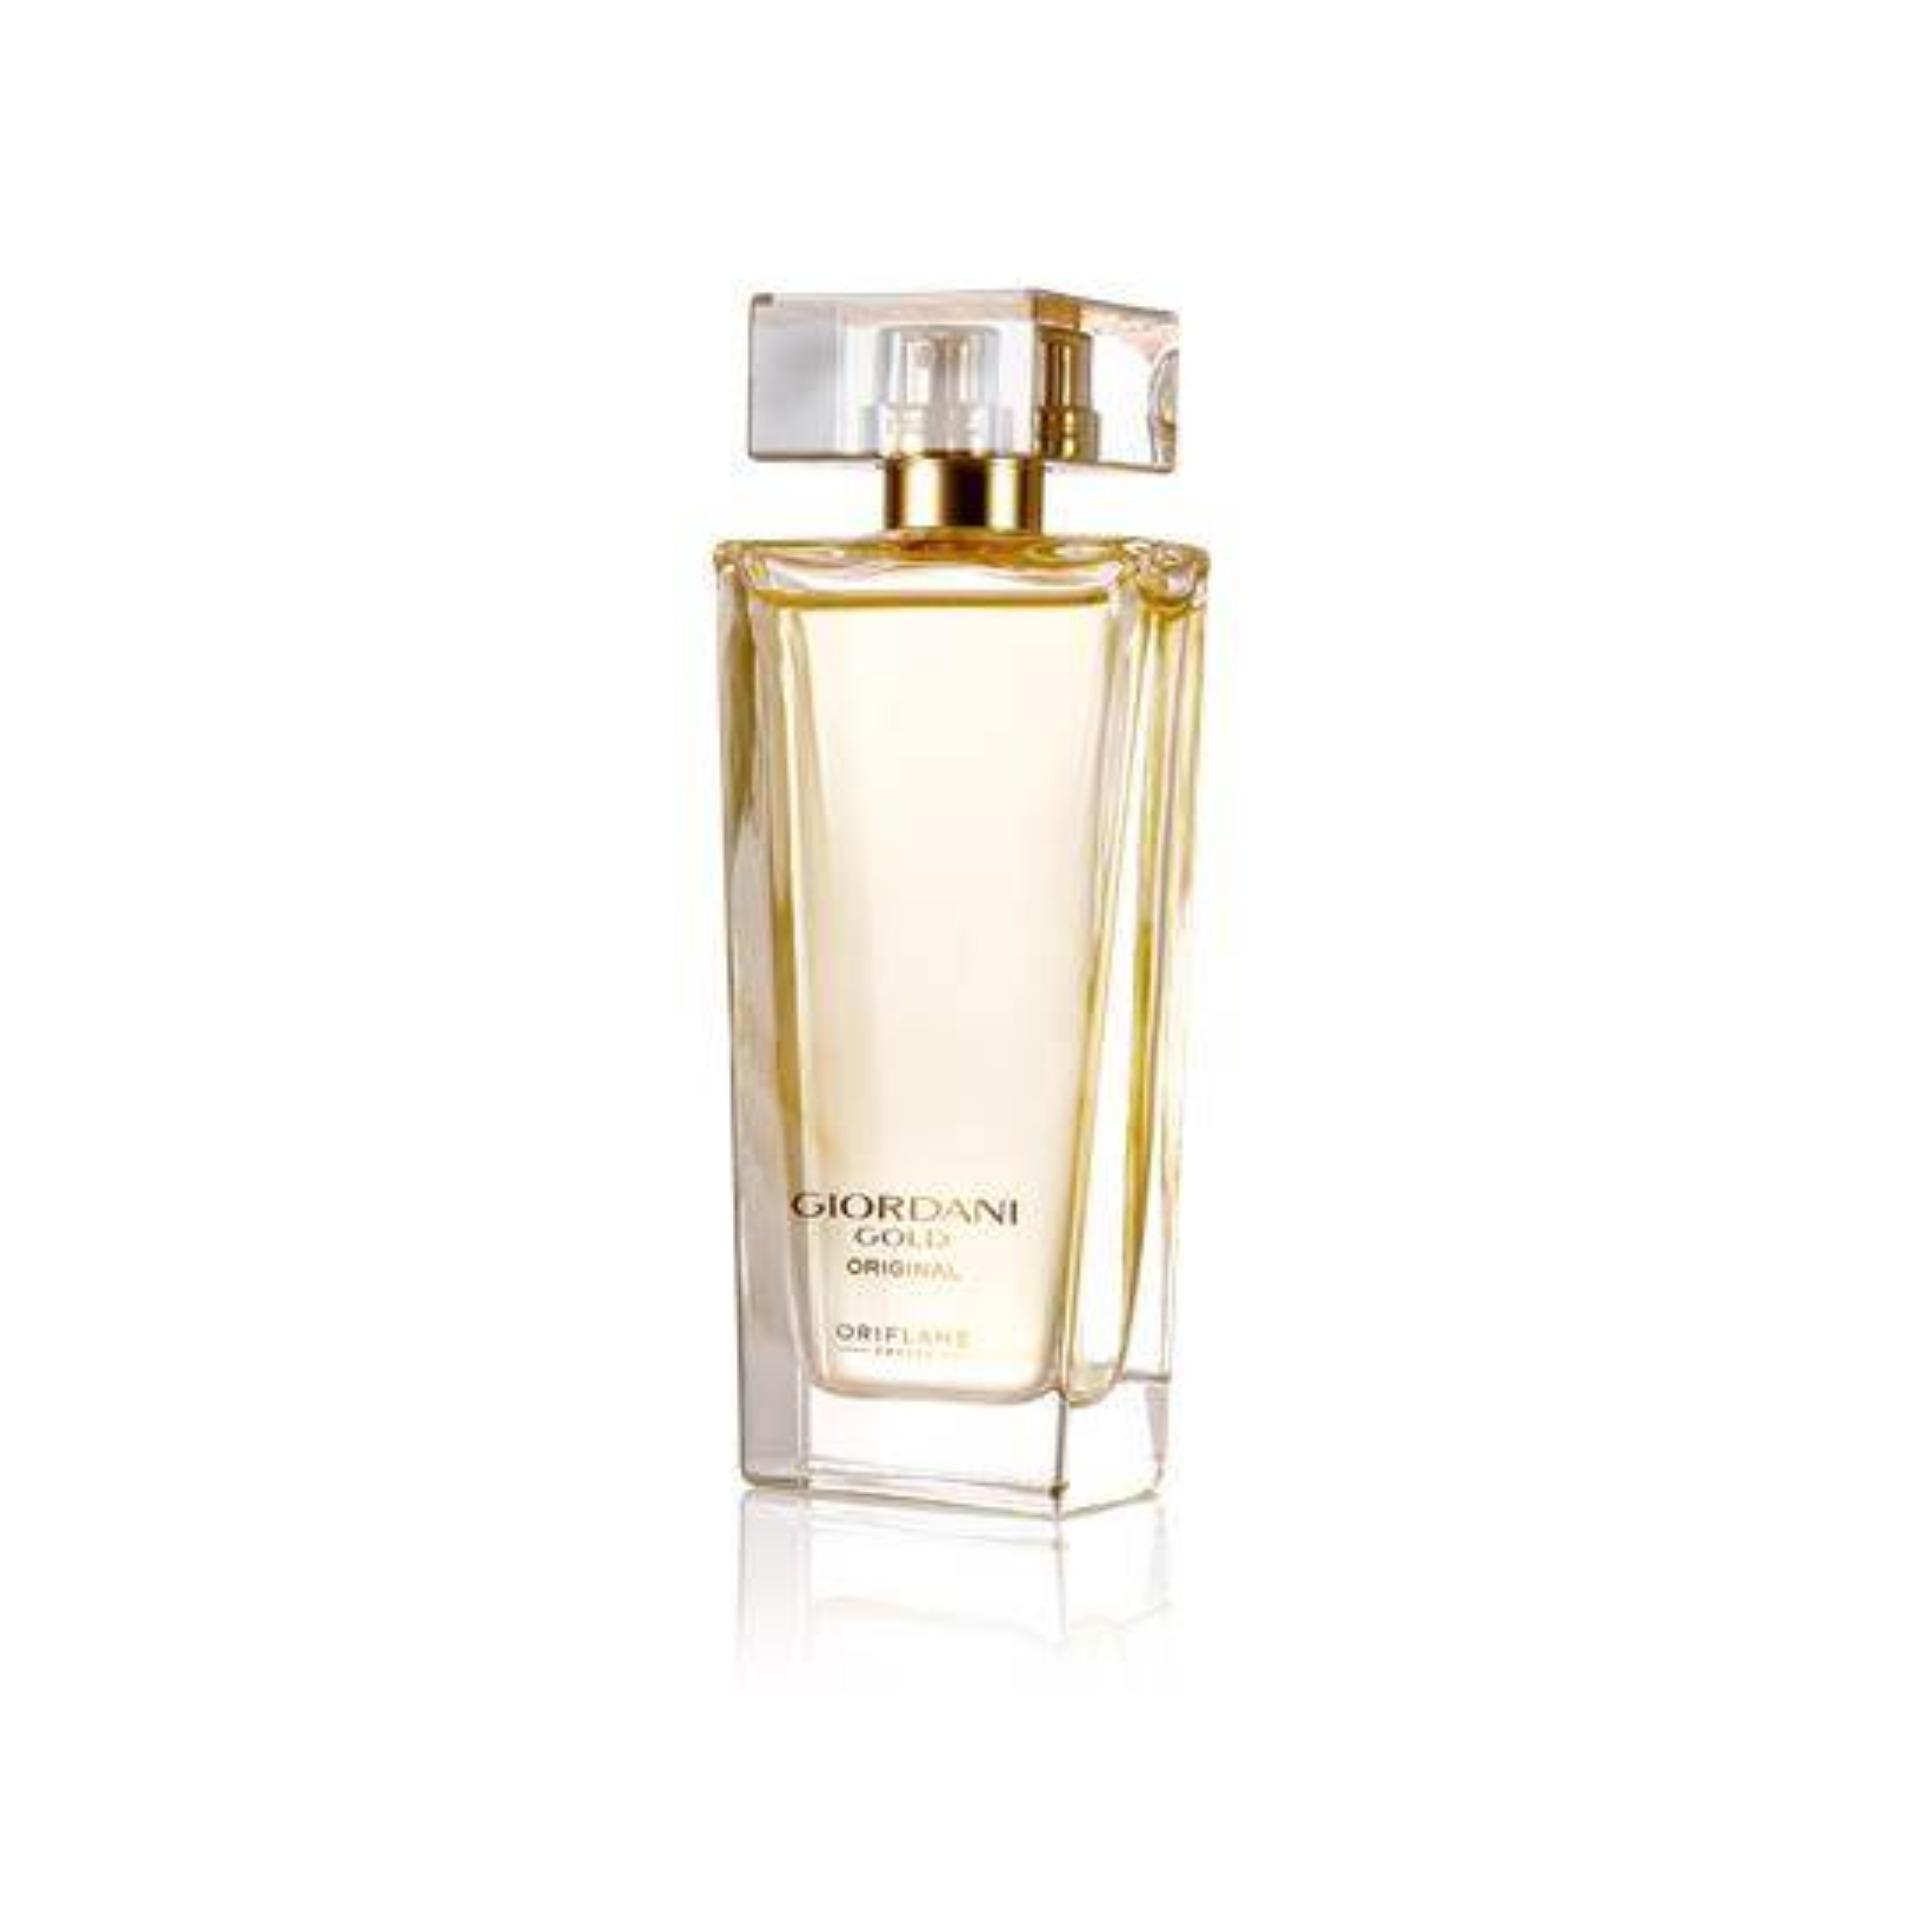 Gi U I Nc Hoa N Giordani Gold Original Eau De Parfum 32150 Volare 50ml By Oryflame Mua Ngay Ch 372320